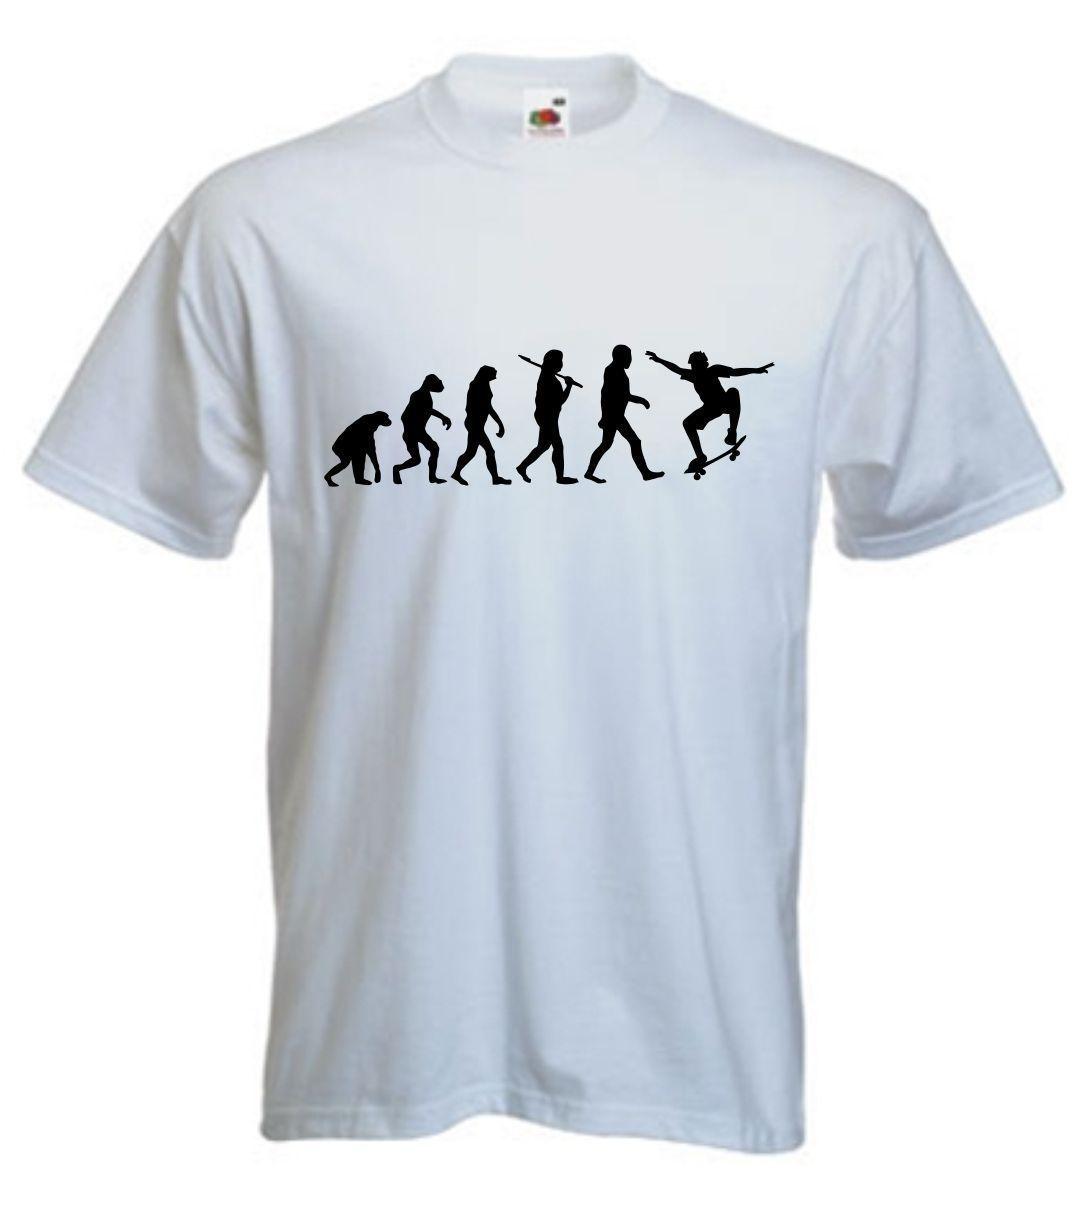 3107638569f Evolution Of Skate T Shirt Skating TShirt Skater T Shirt Skateboard S XXL  Style Round Style Tshirt Tees Custom Jersey T Shirt Clever Funny T Shirts  Funny ...